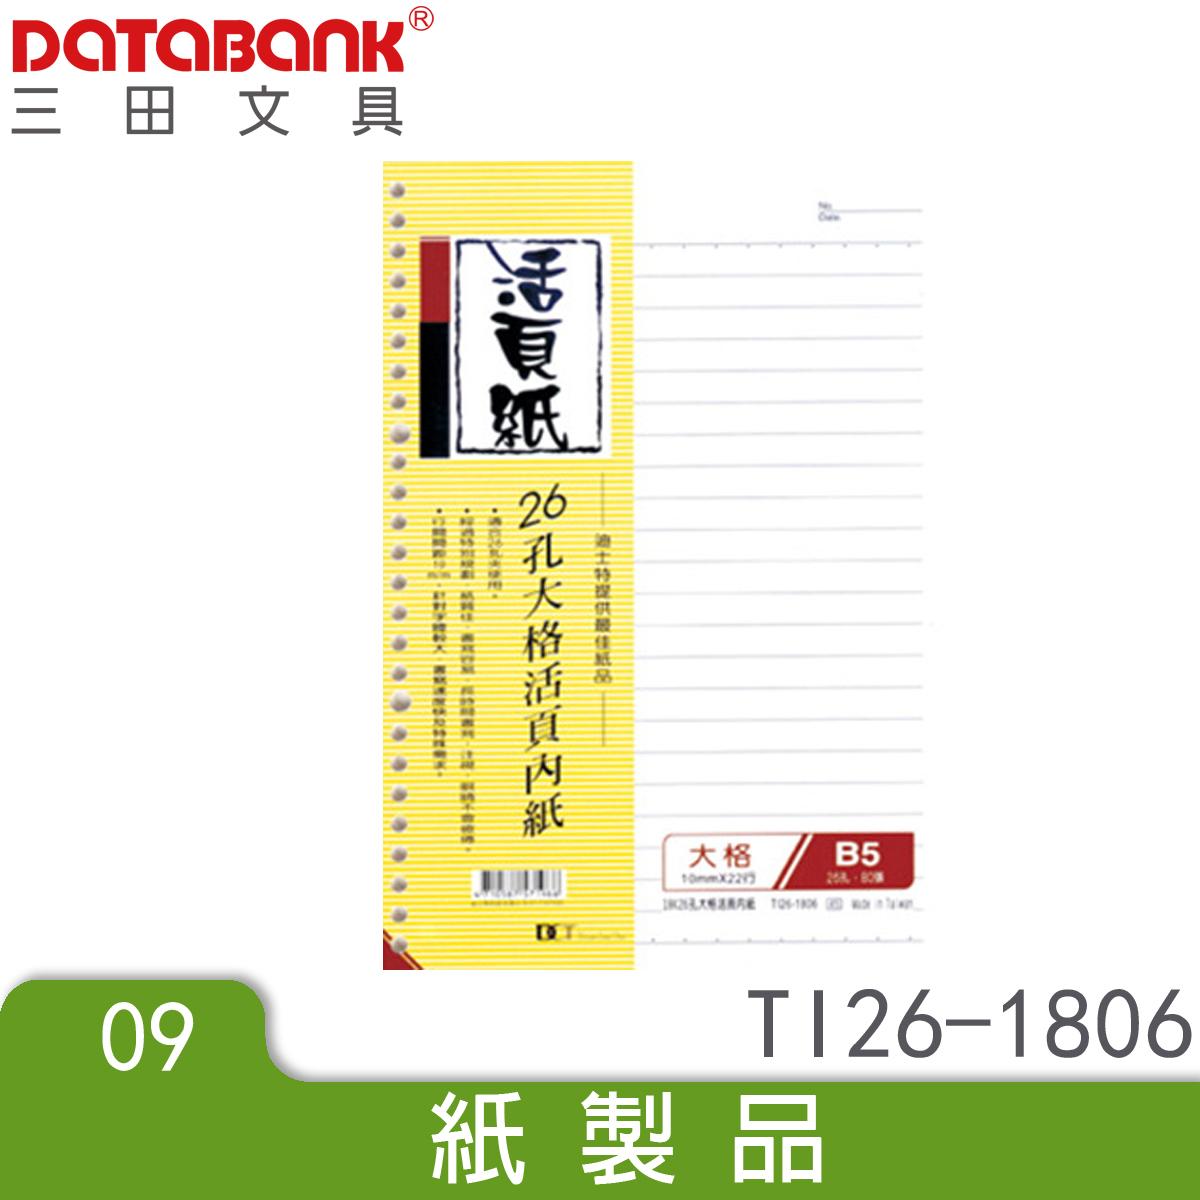 18K 26孔大格內紙(TI26-1806) 小記事本 memo紙 文件紀錄紙 DATABANK